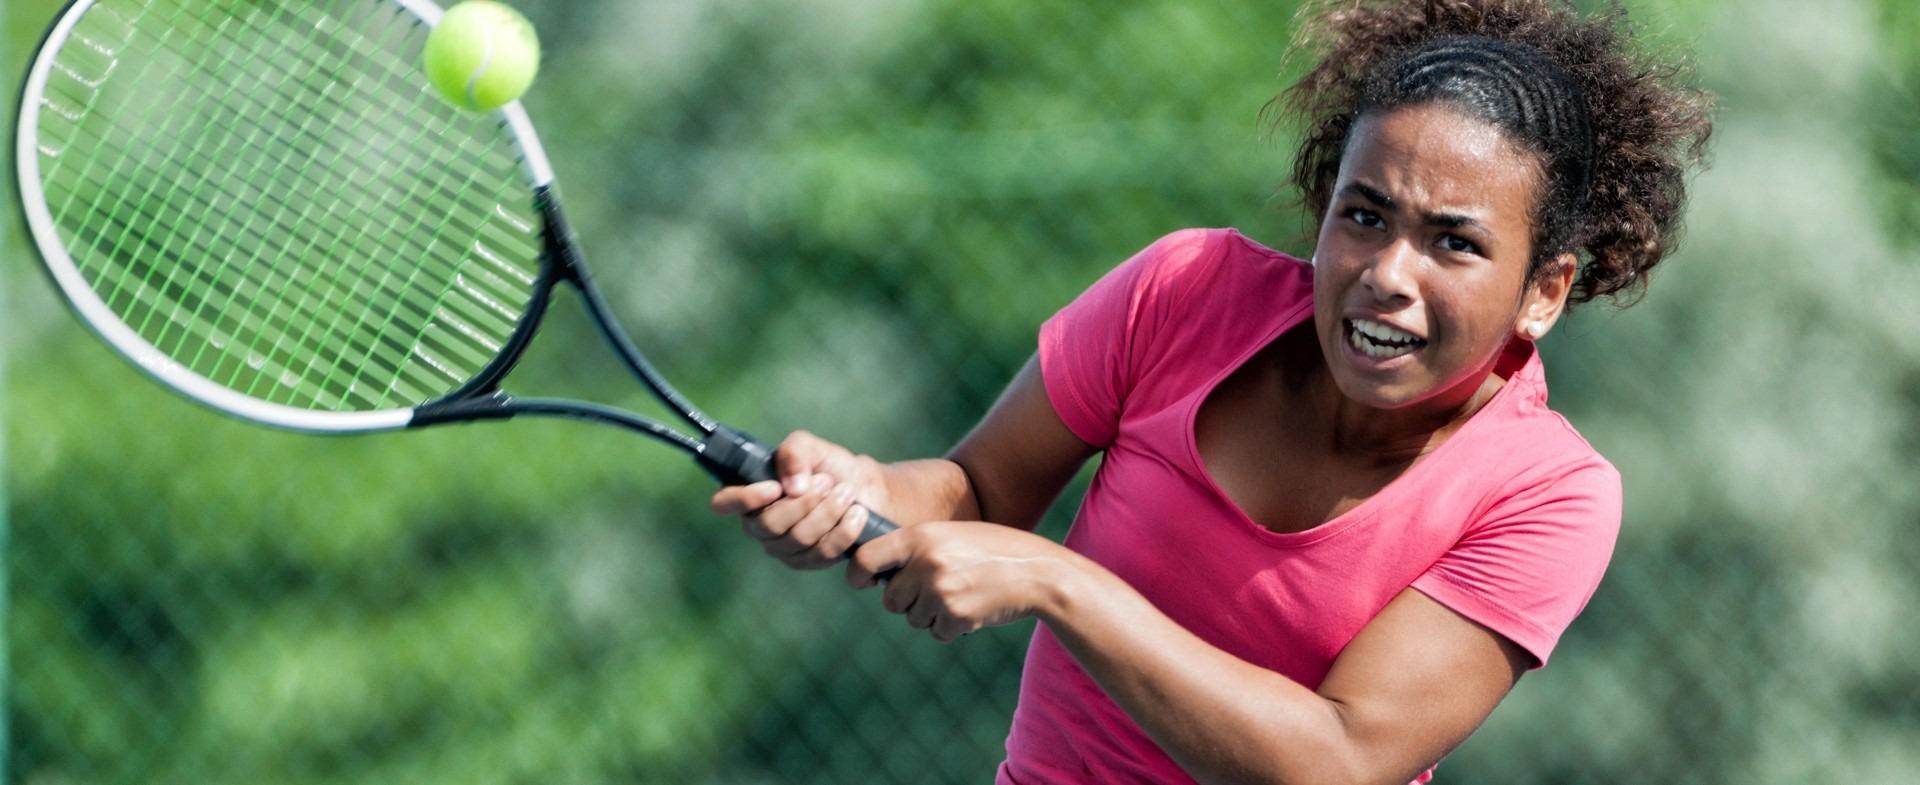 Girl swinging a tennis racket